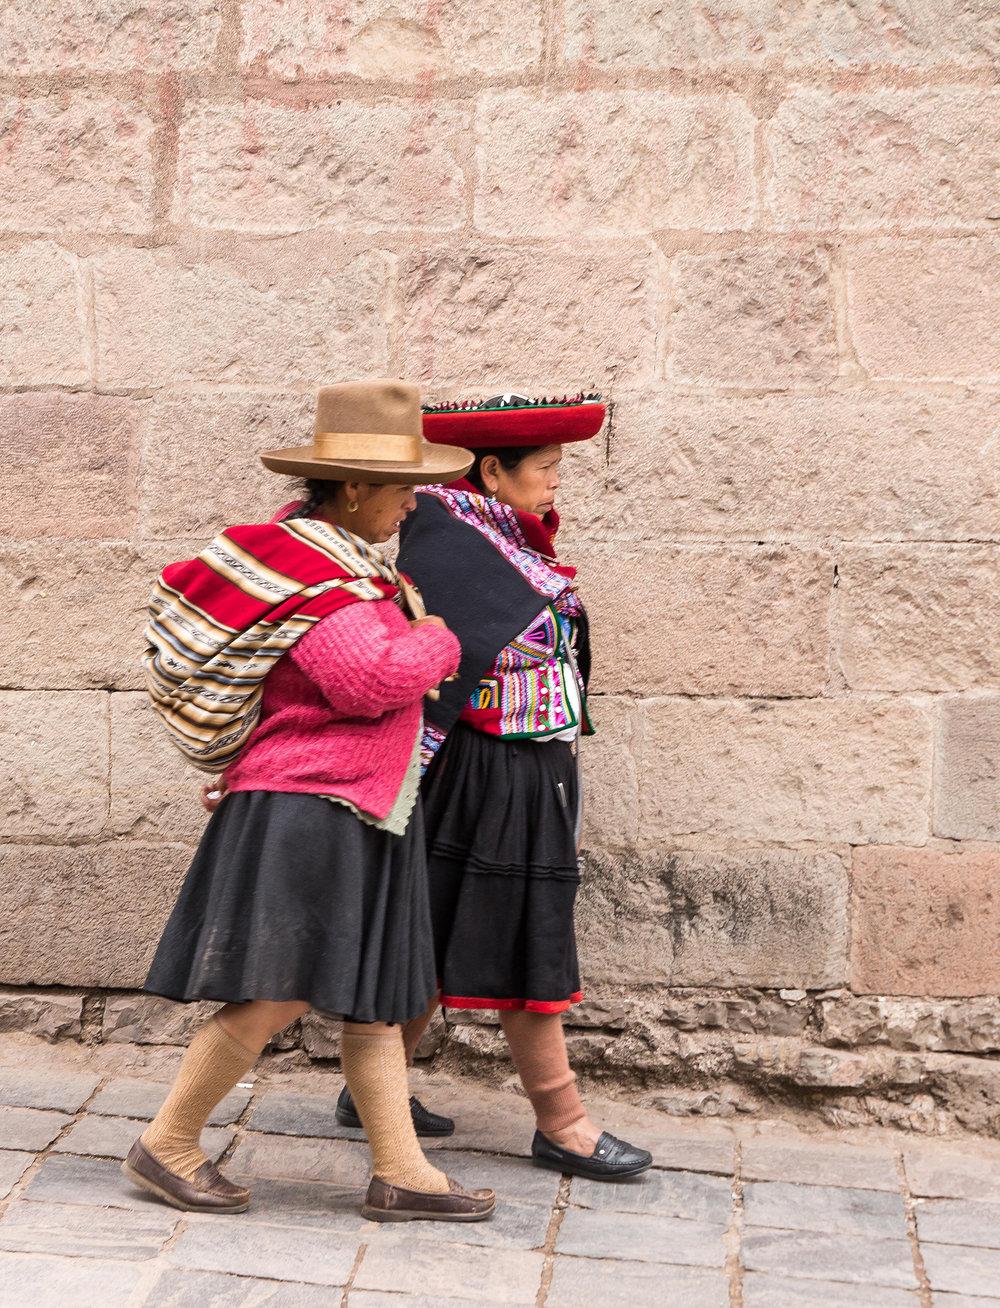 Cusco-362.jpg